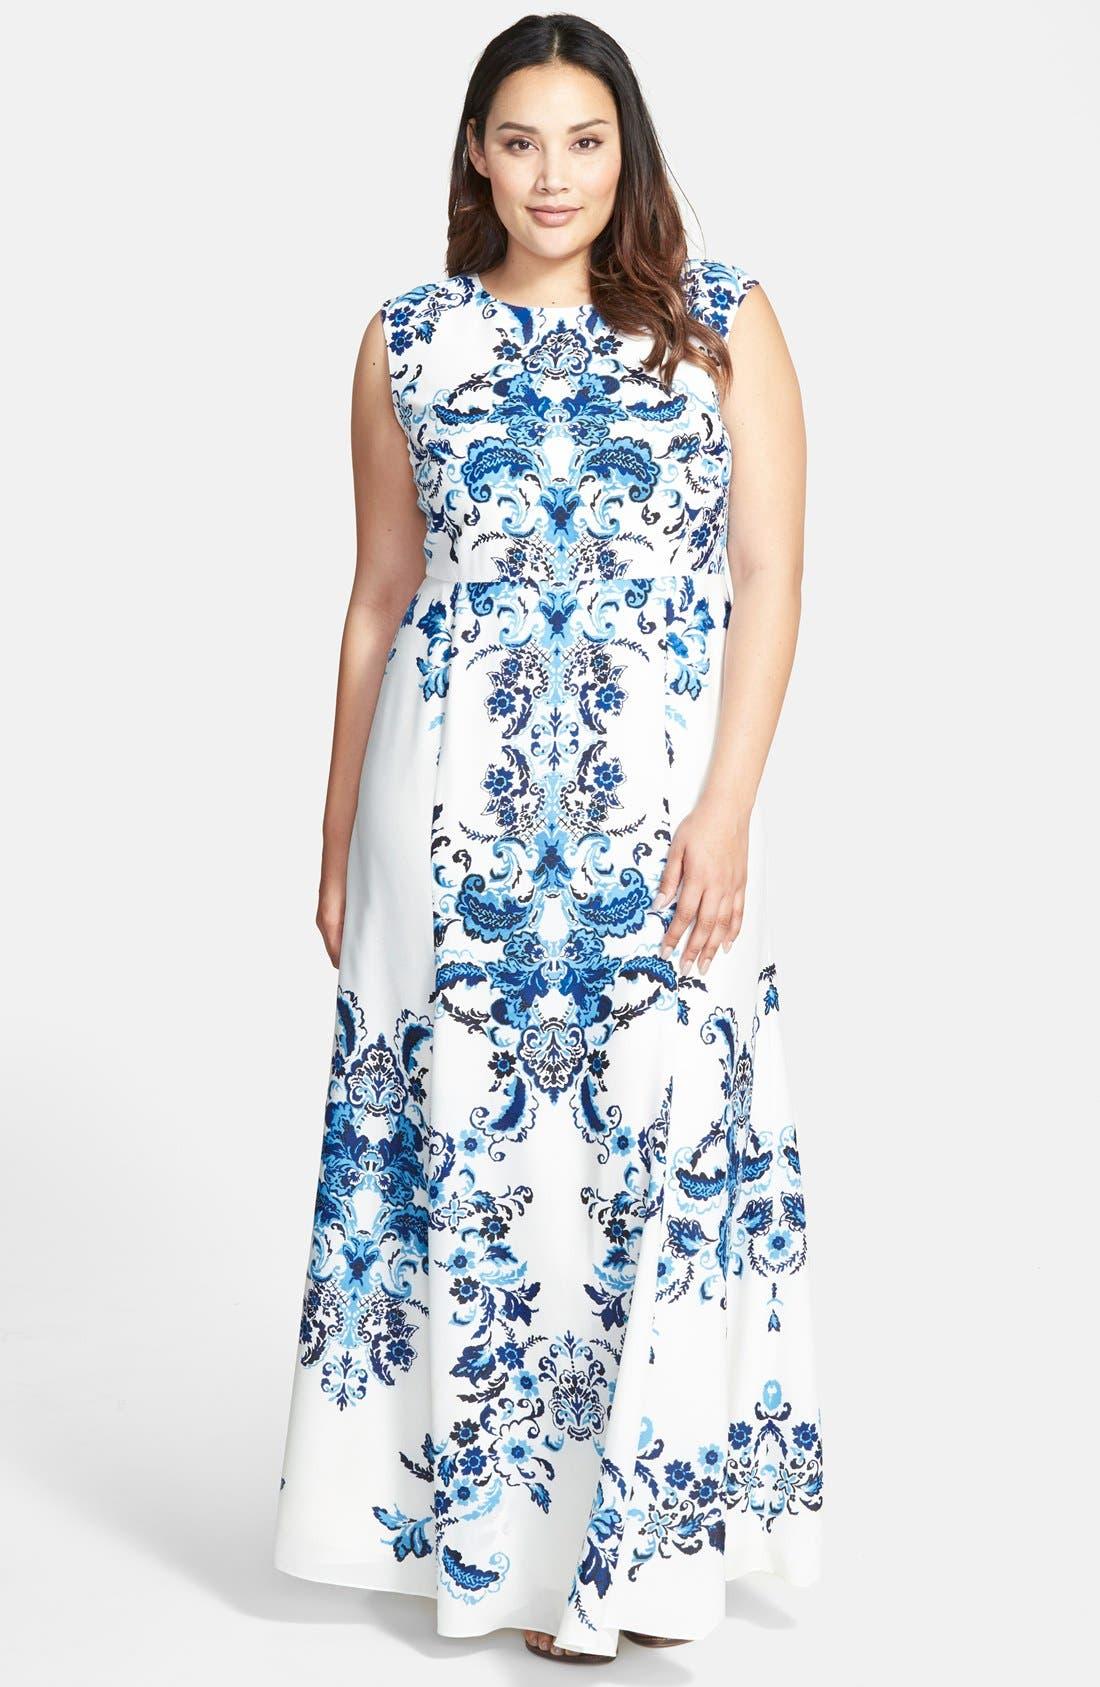 Alternate Image 1 Selected - Eliza J Placed Print Crêpe de Chine Maxi Dress (Plus Size)